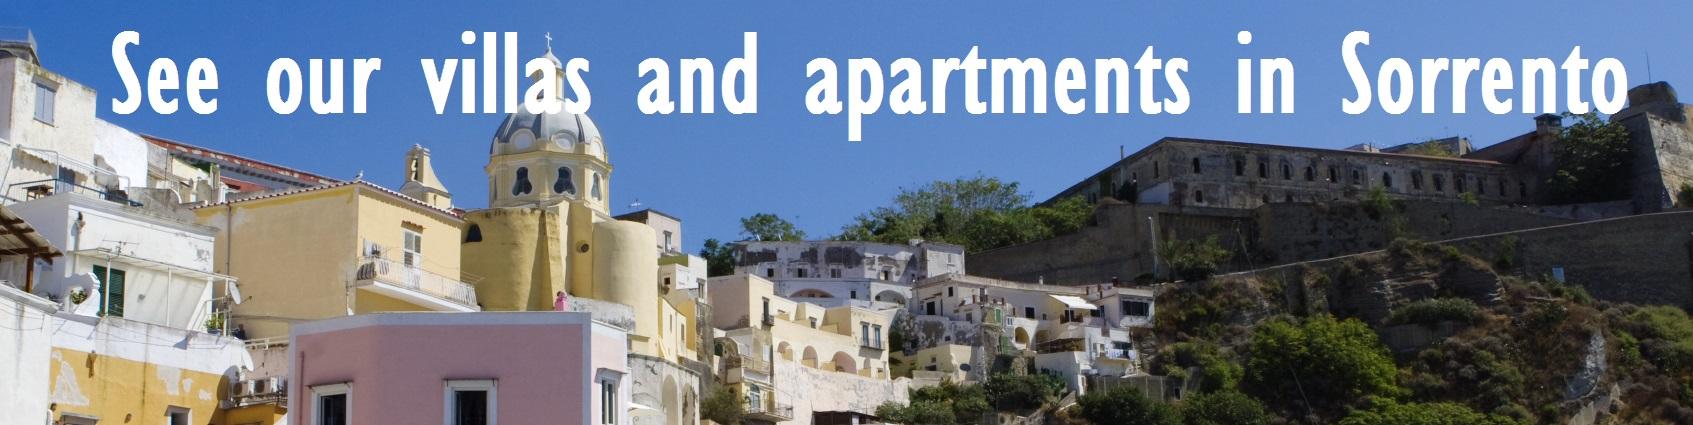 Villas and apartments in Sorrento